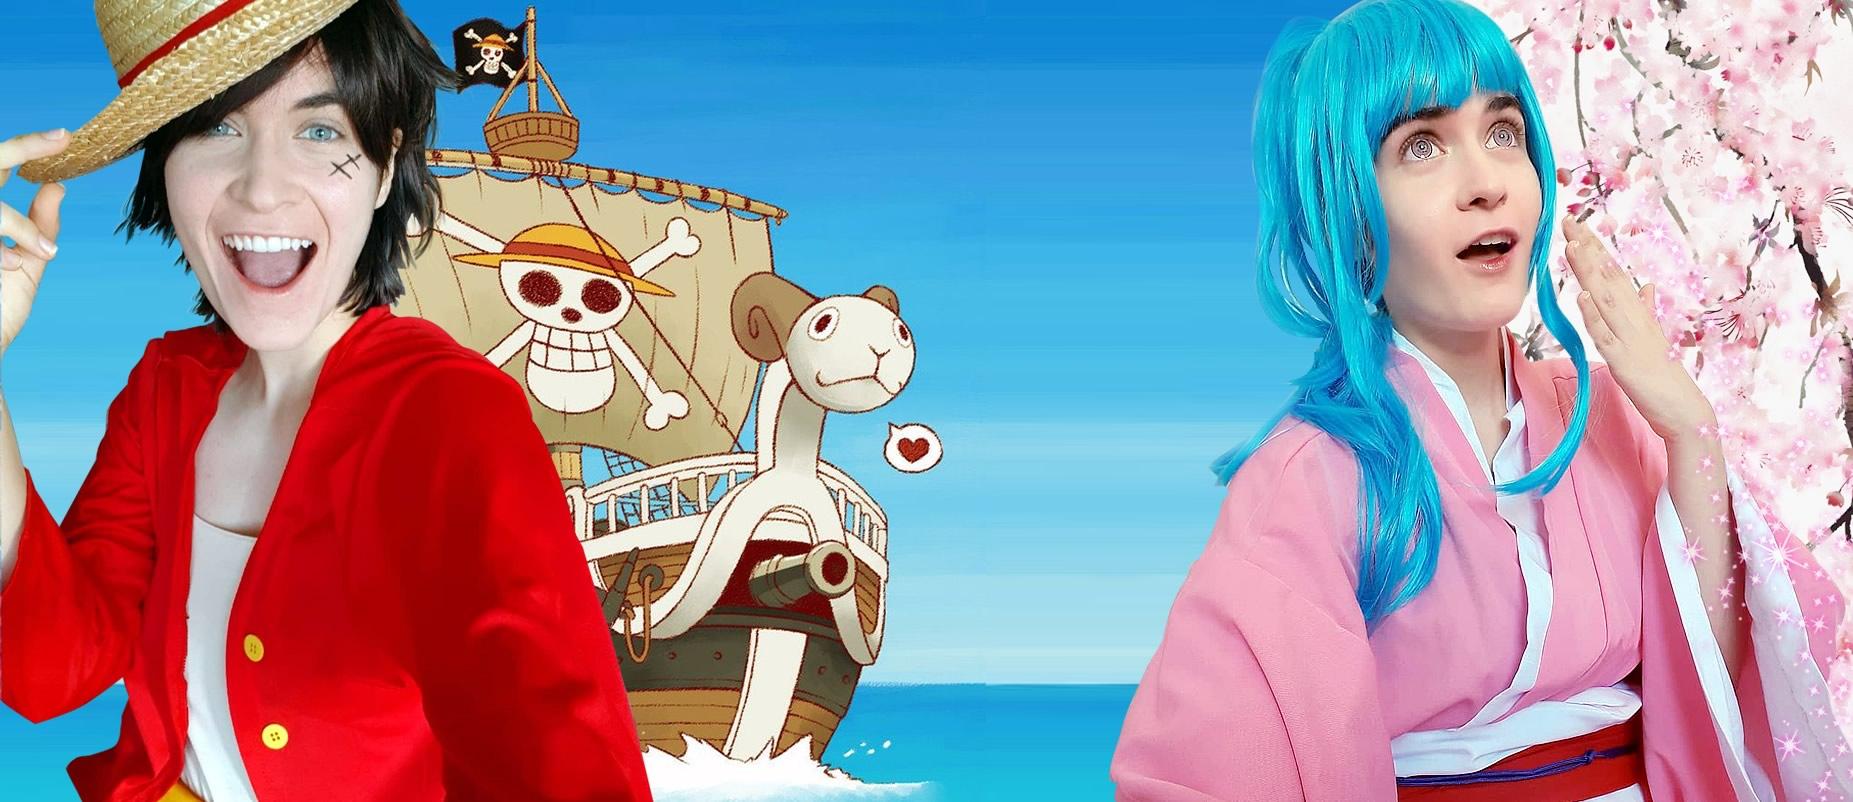 nandamidoricosplay - Nanda Midori - Anime Girl